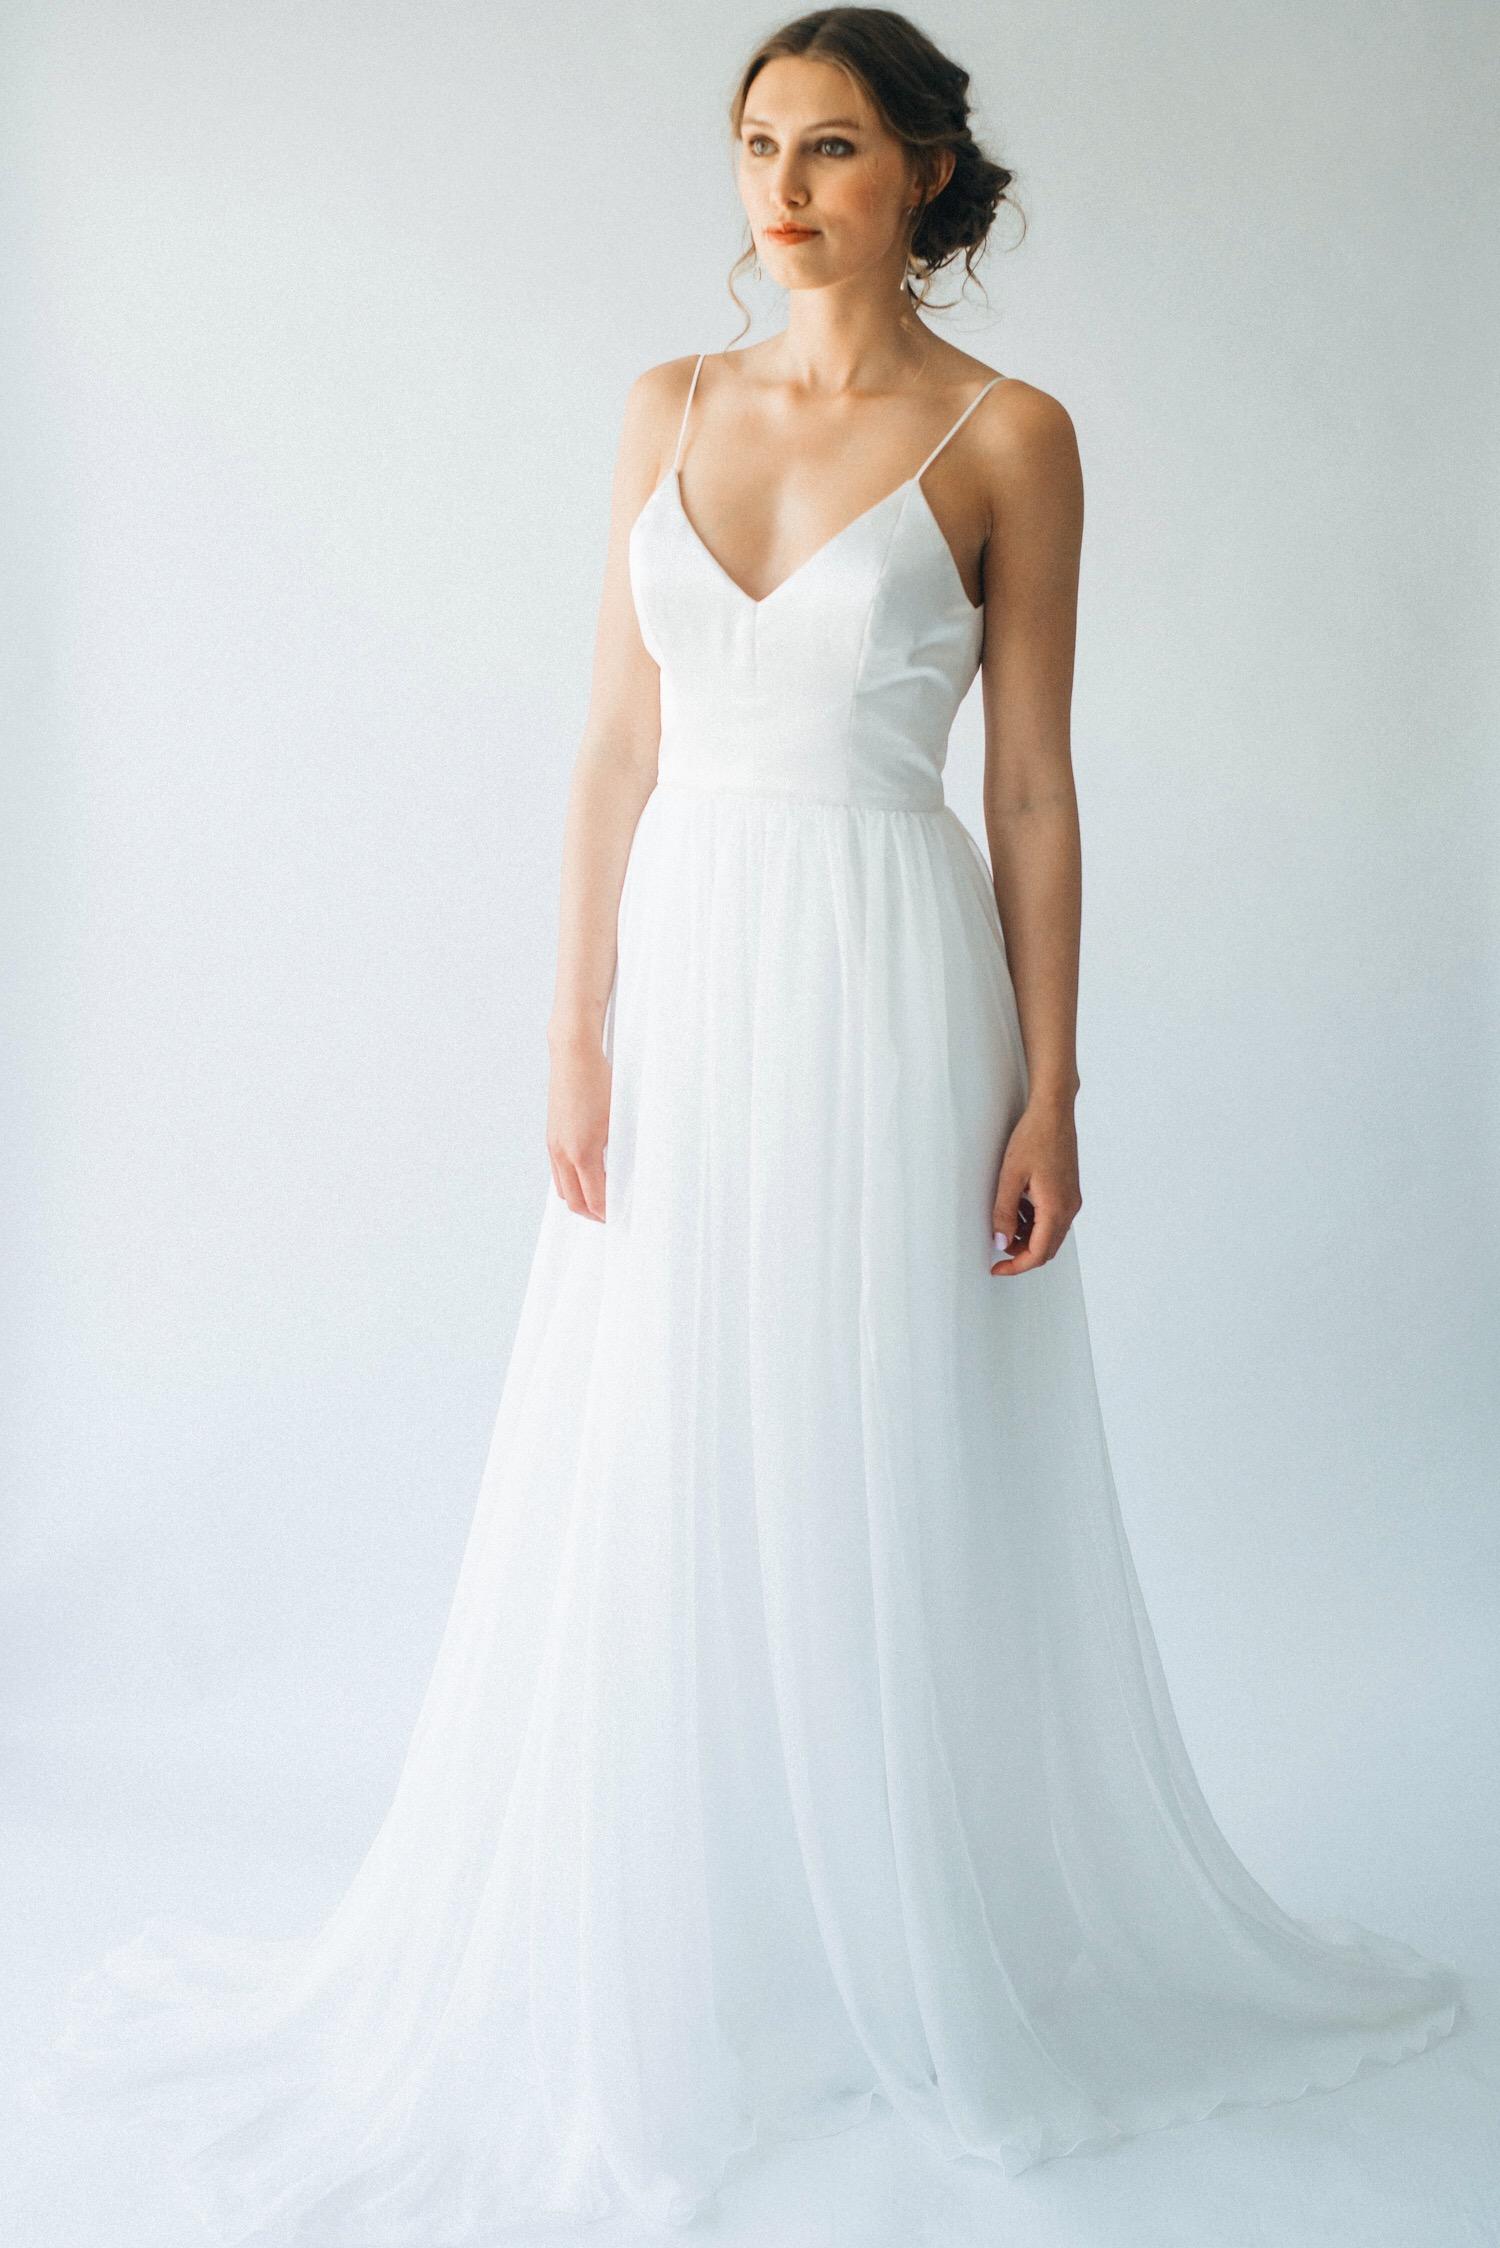 Bespoke handmade bridal gown Falmouth